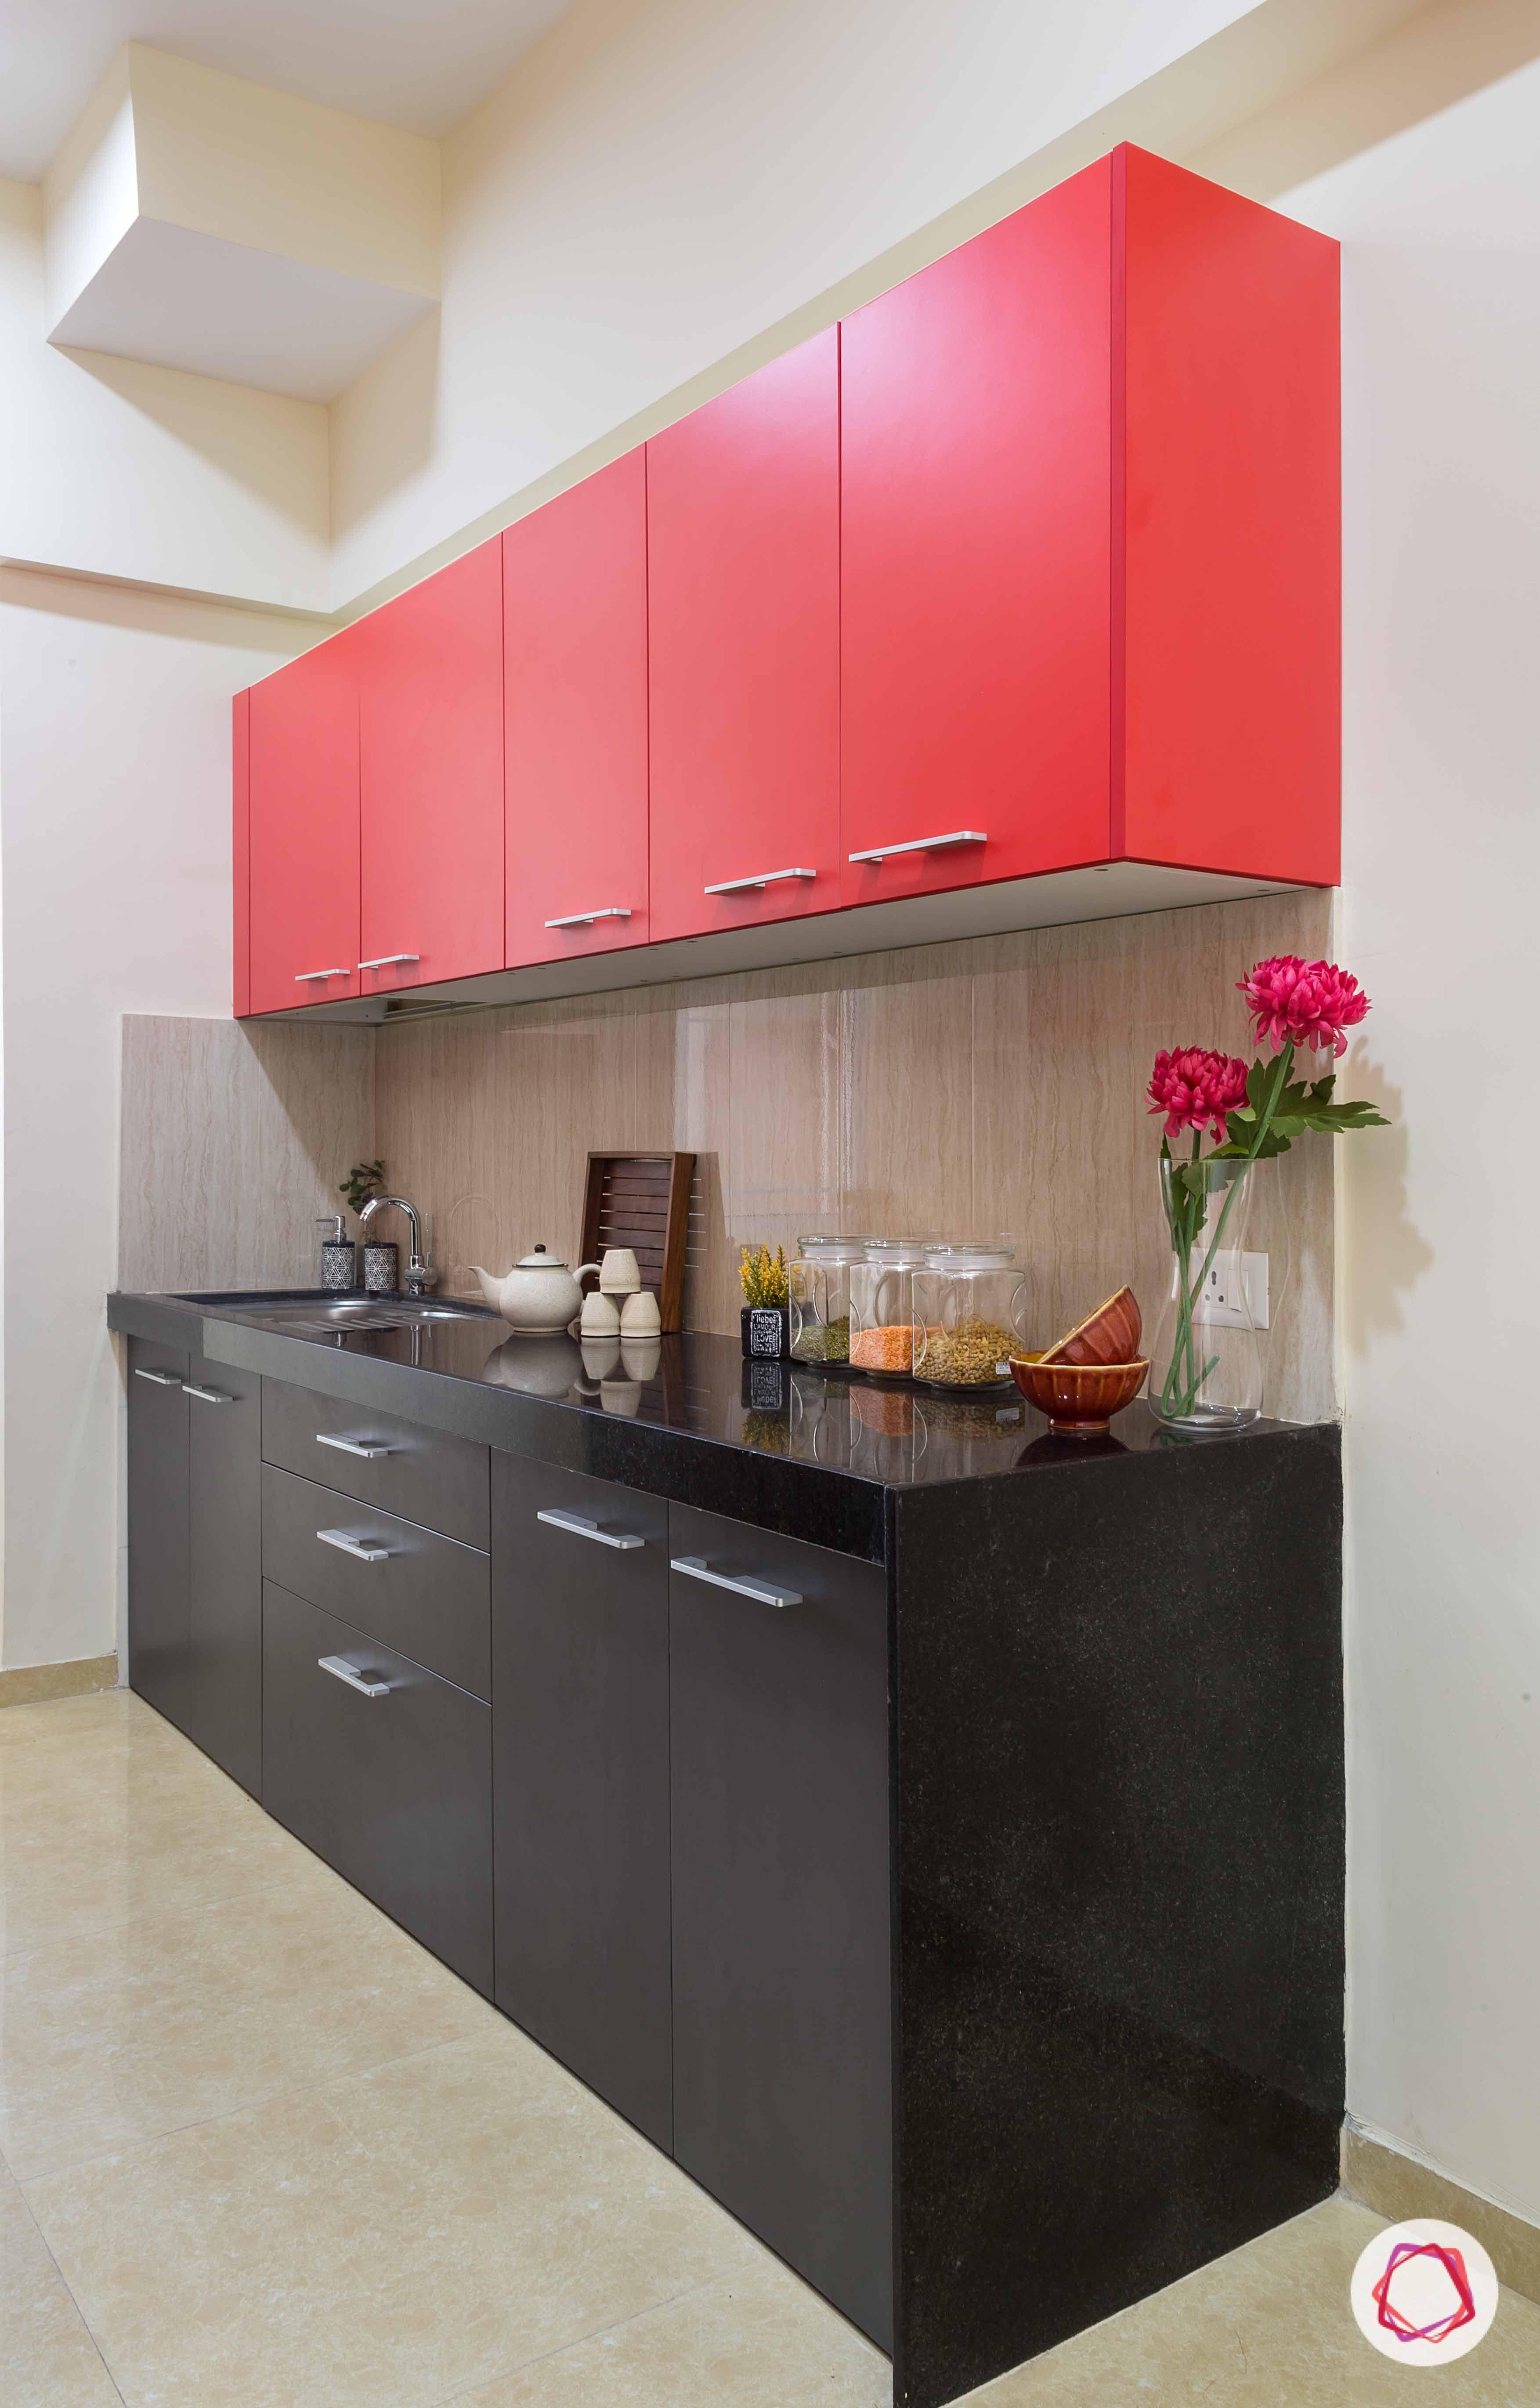 Modular Kitchen In Pop Colors Black Red And A Beige Backsplash To